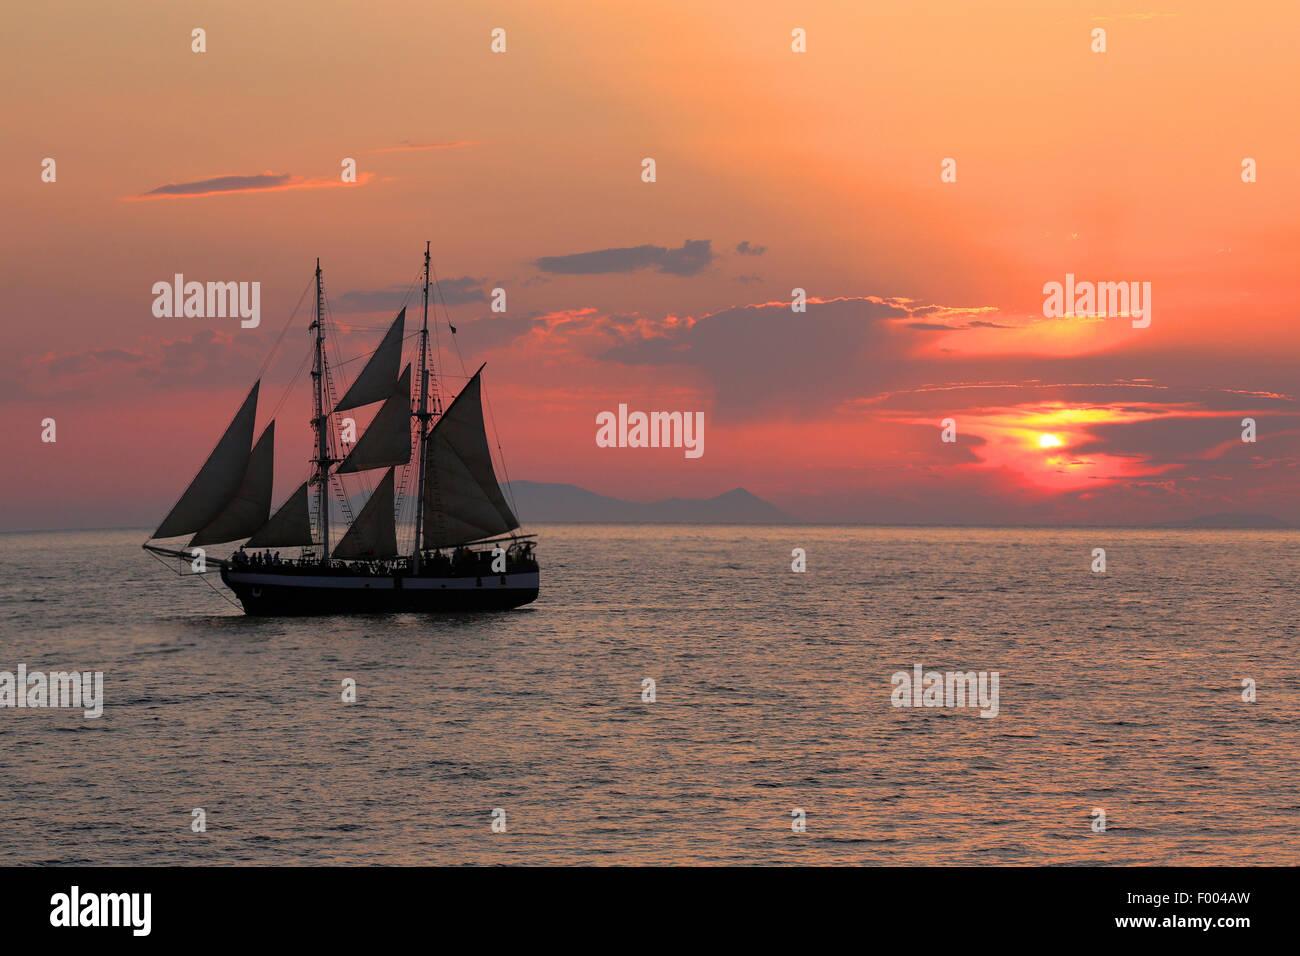 Segelschiff bei Sonnenuntergang, Griechenland, Kykladen, Santorin Stockbild